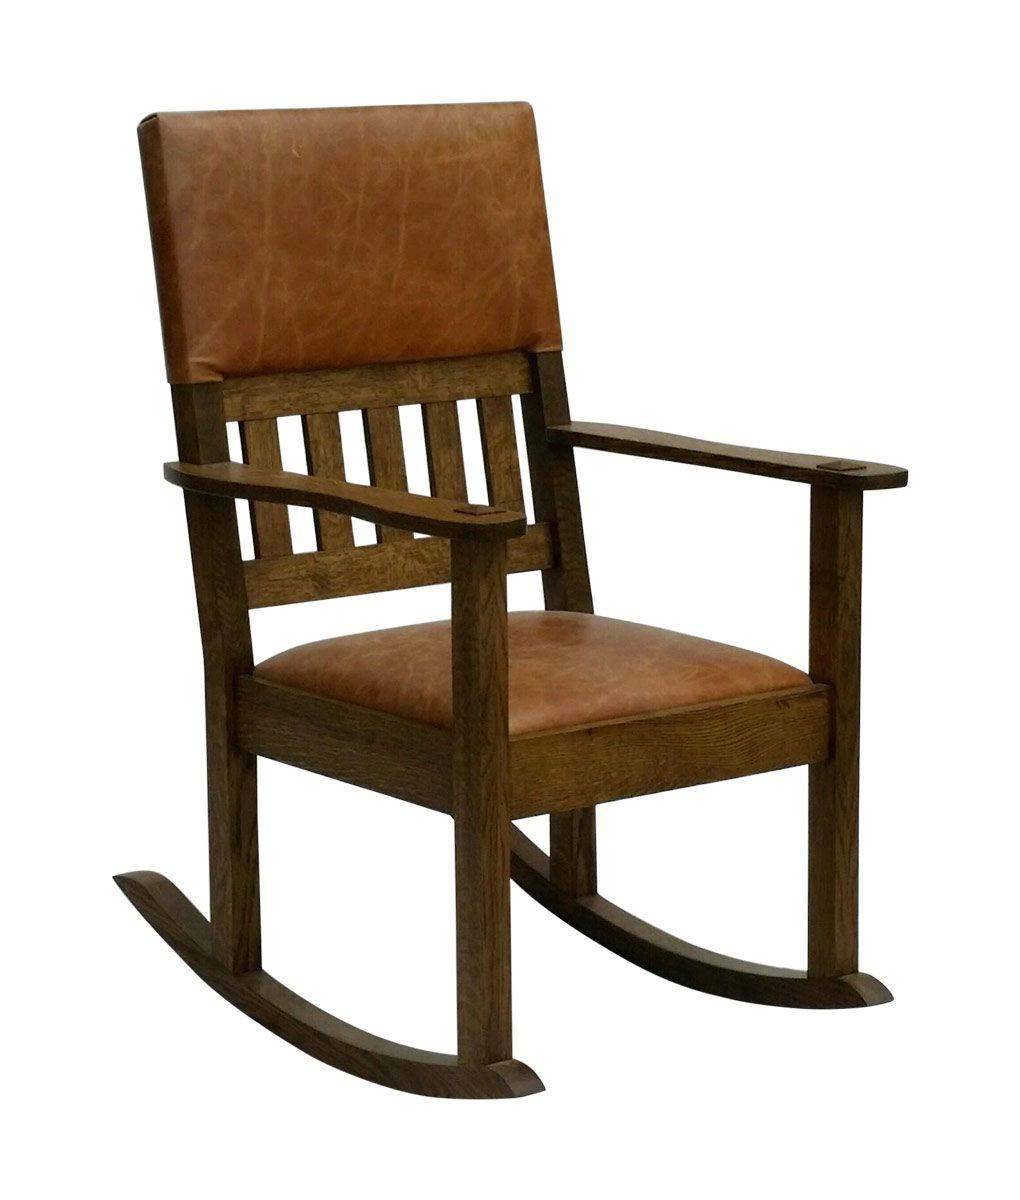 Stickley Mission Craftsman Style Rocking Chair